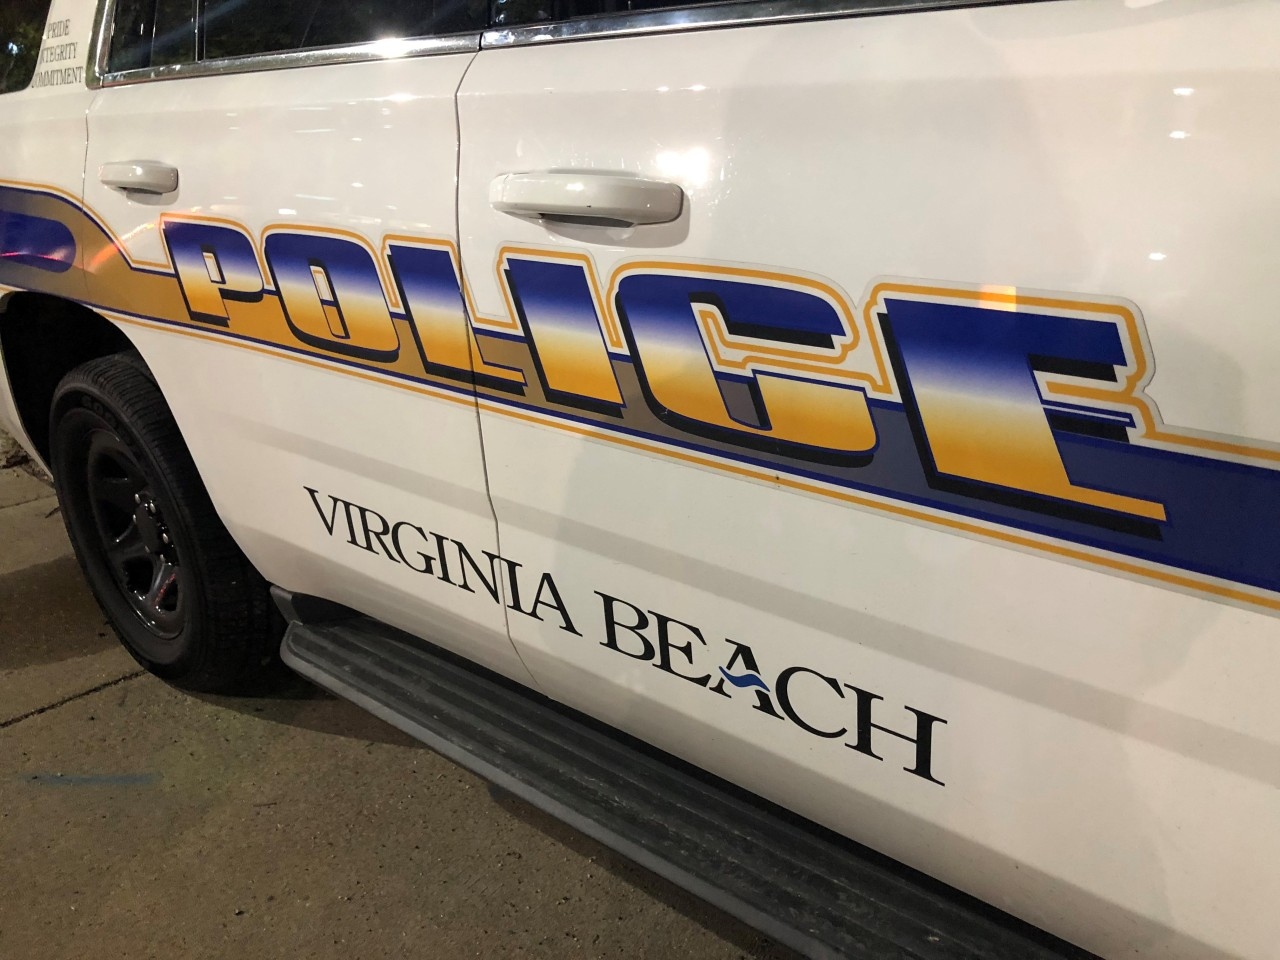 Virginia20Beach20Police20Generic 1524974050710 4 jpg 41105412 ver1 0 4 jpg?w=1280.'